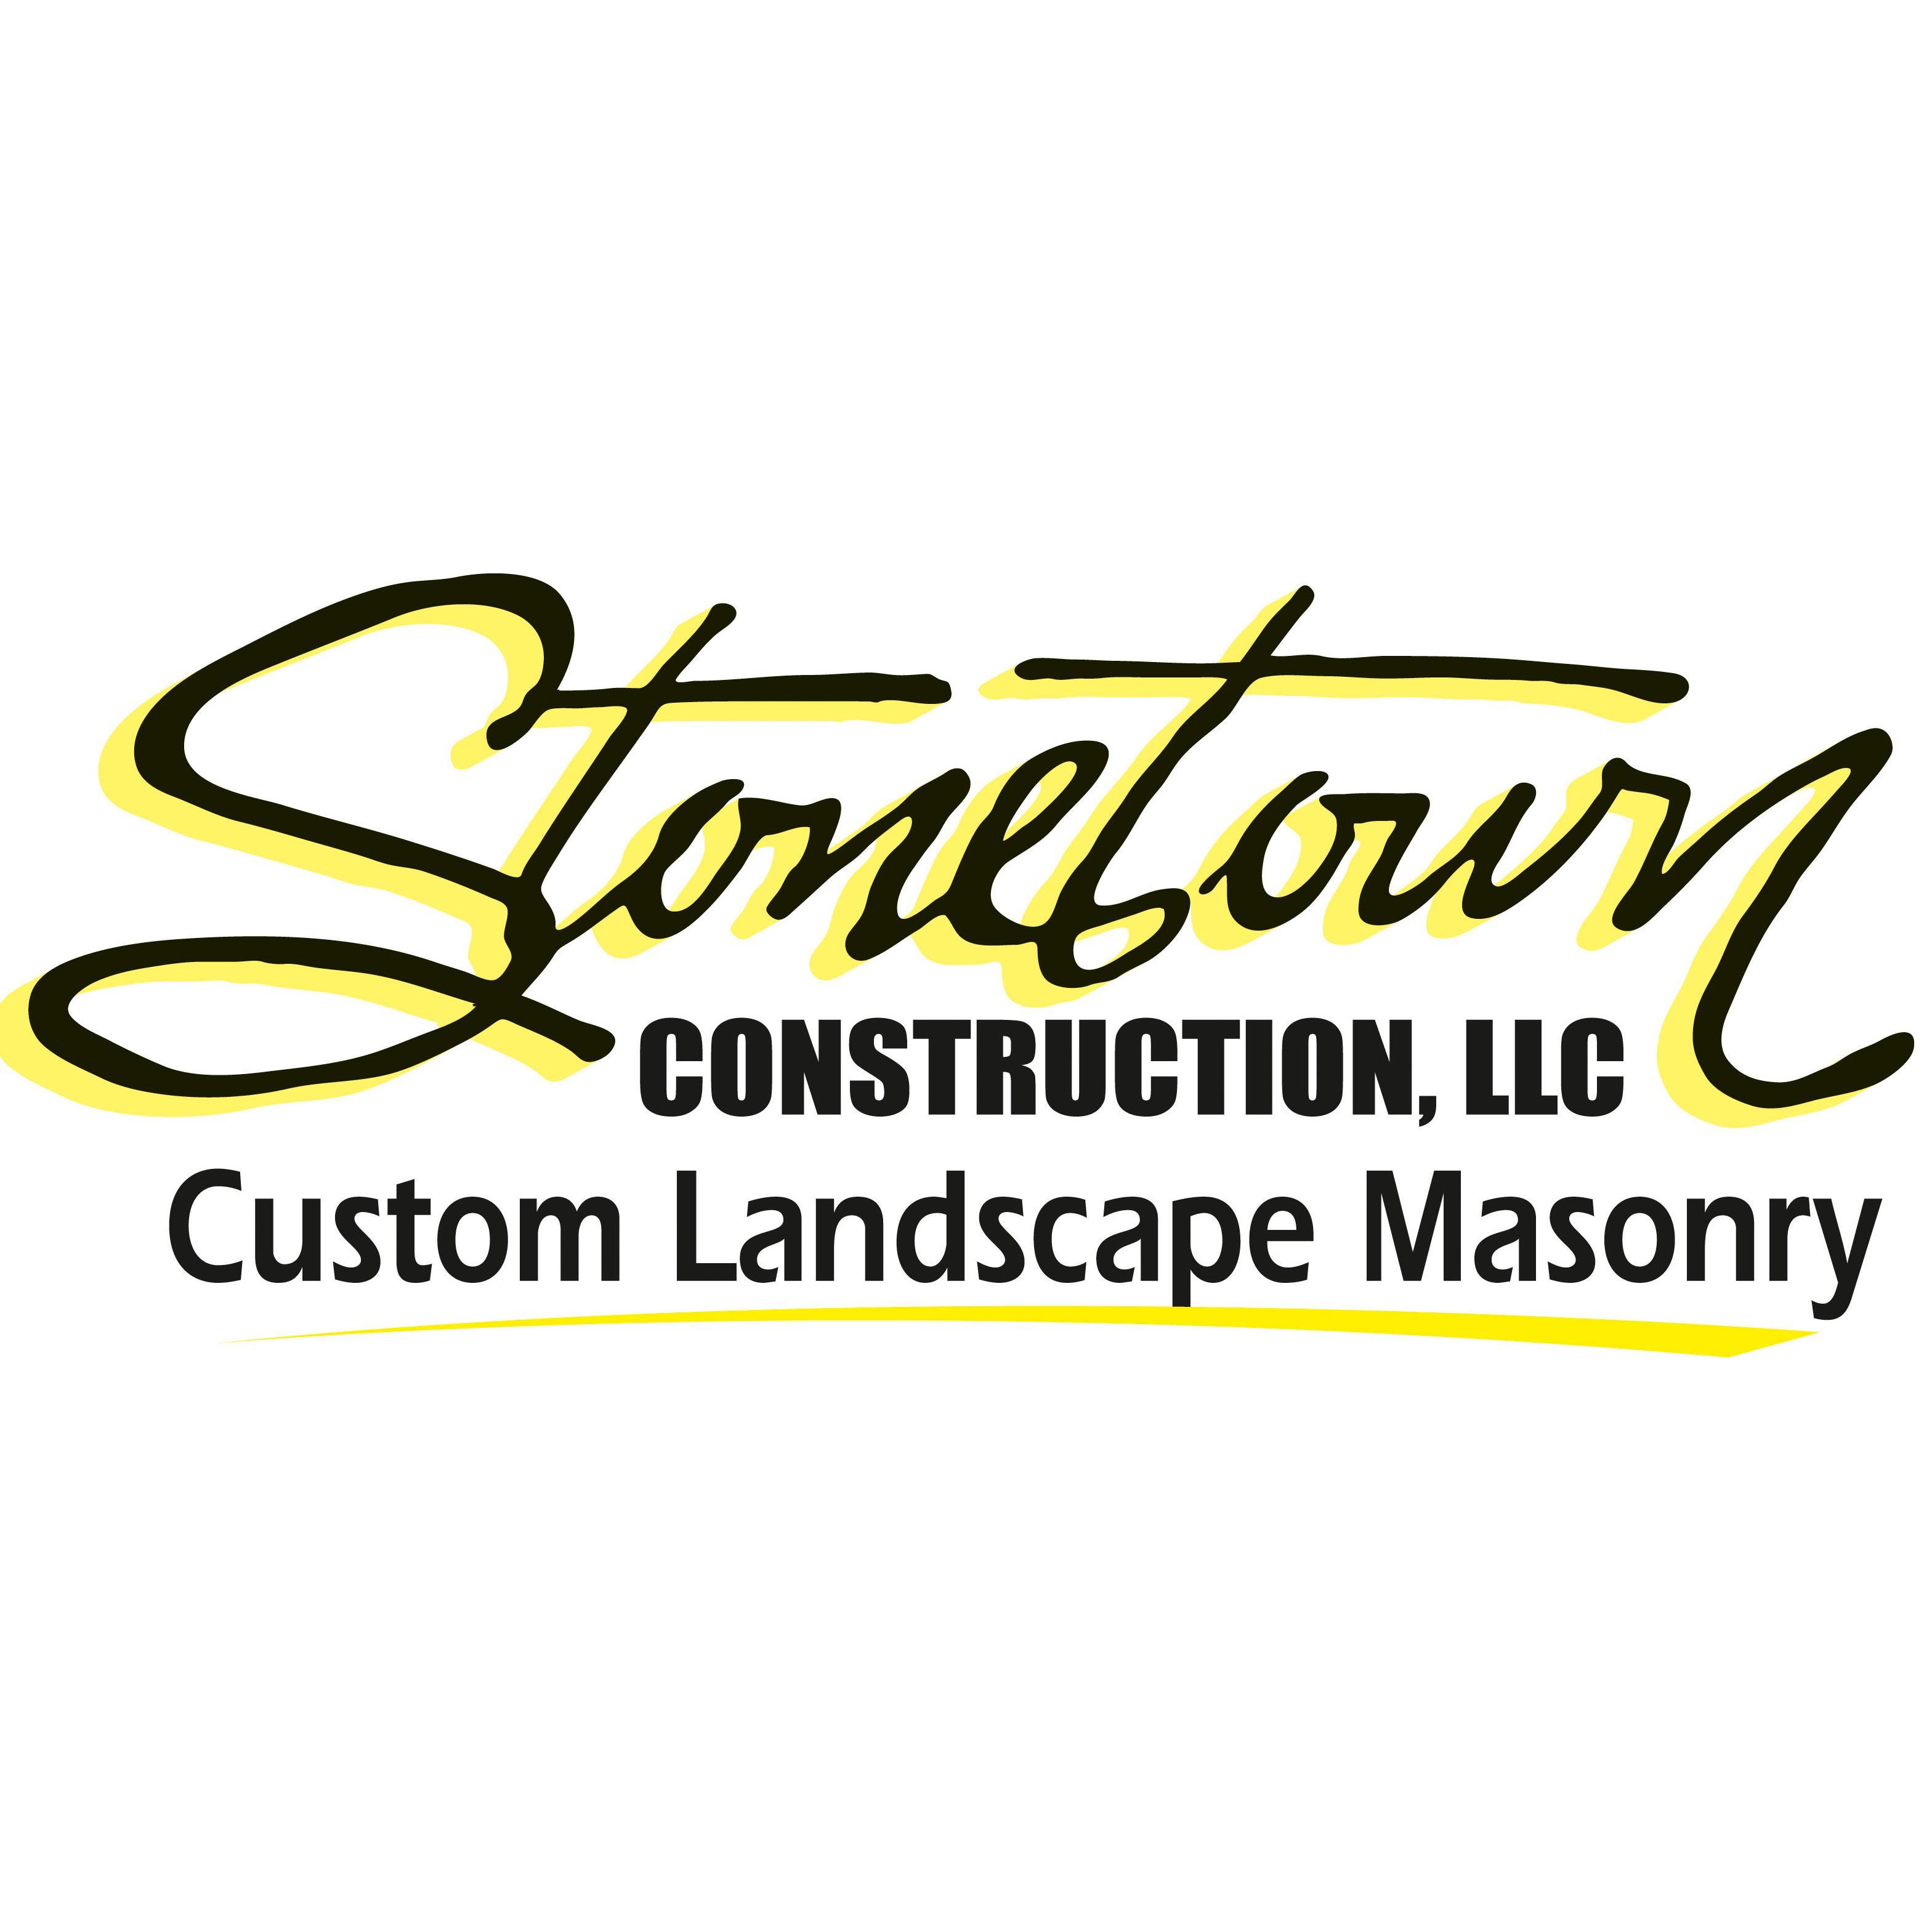 Stonetown Construction